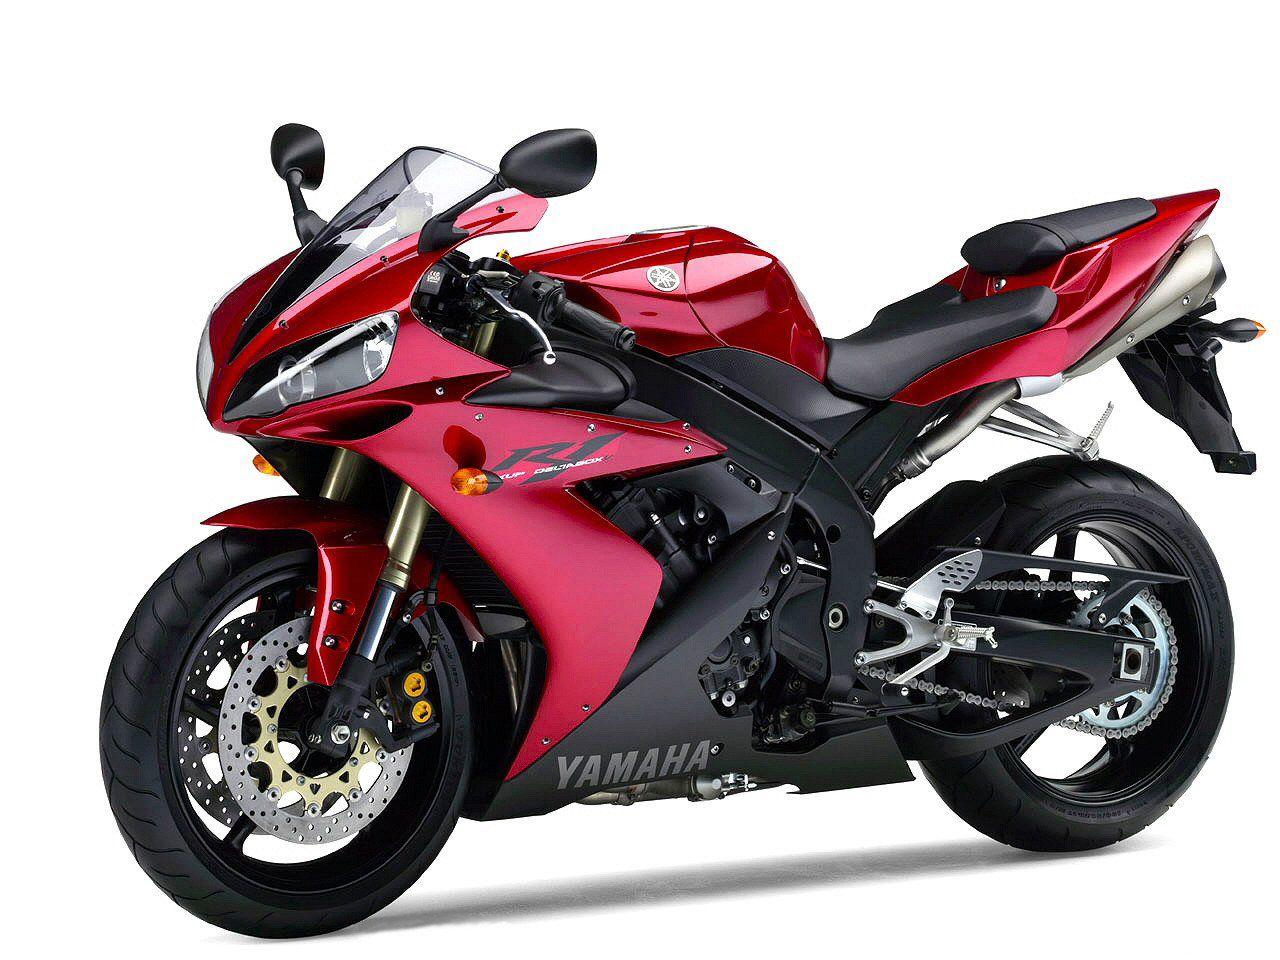 Yamaha r1 superbike wallpaper hd http imashon com w